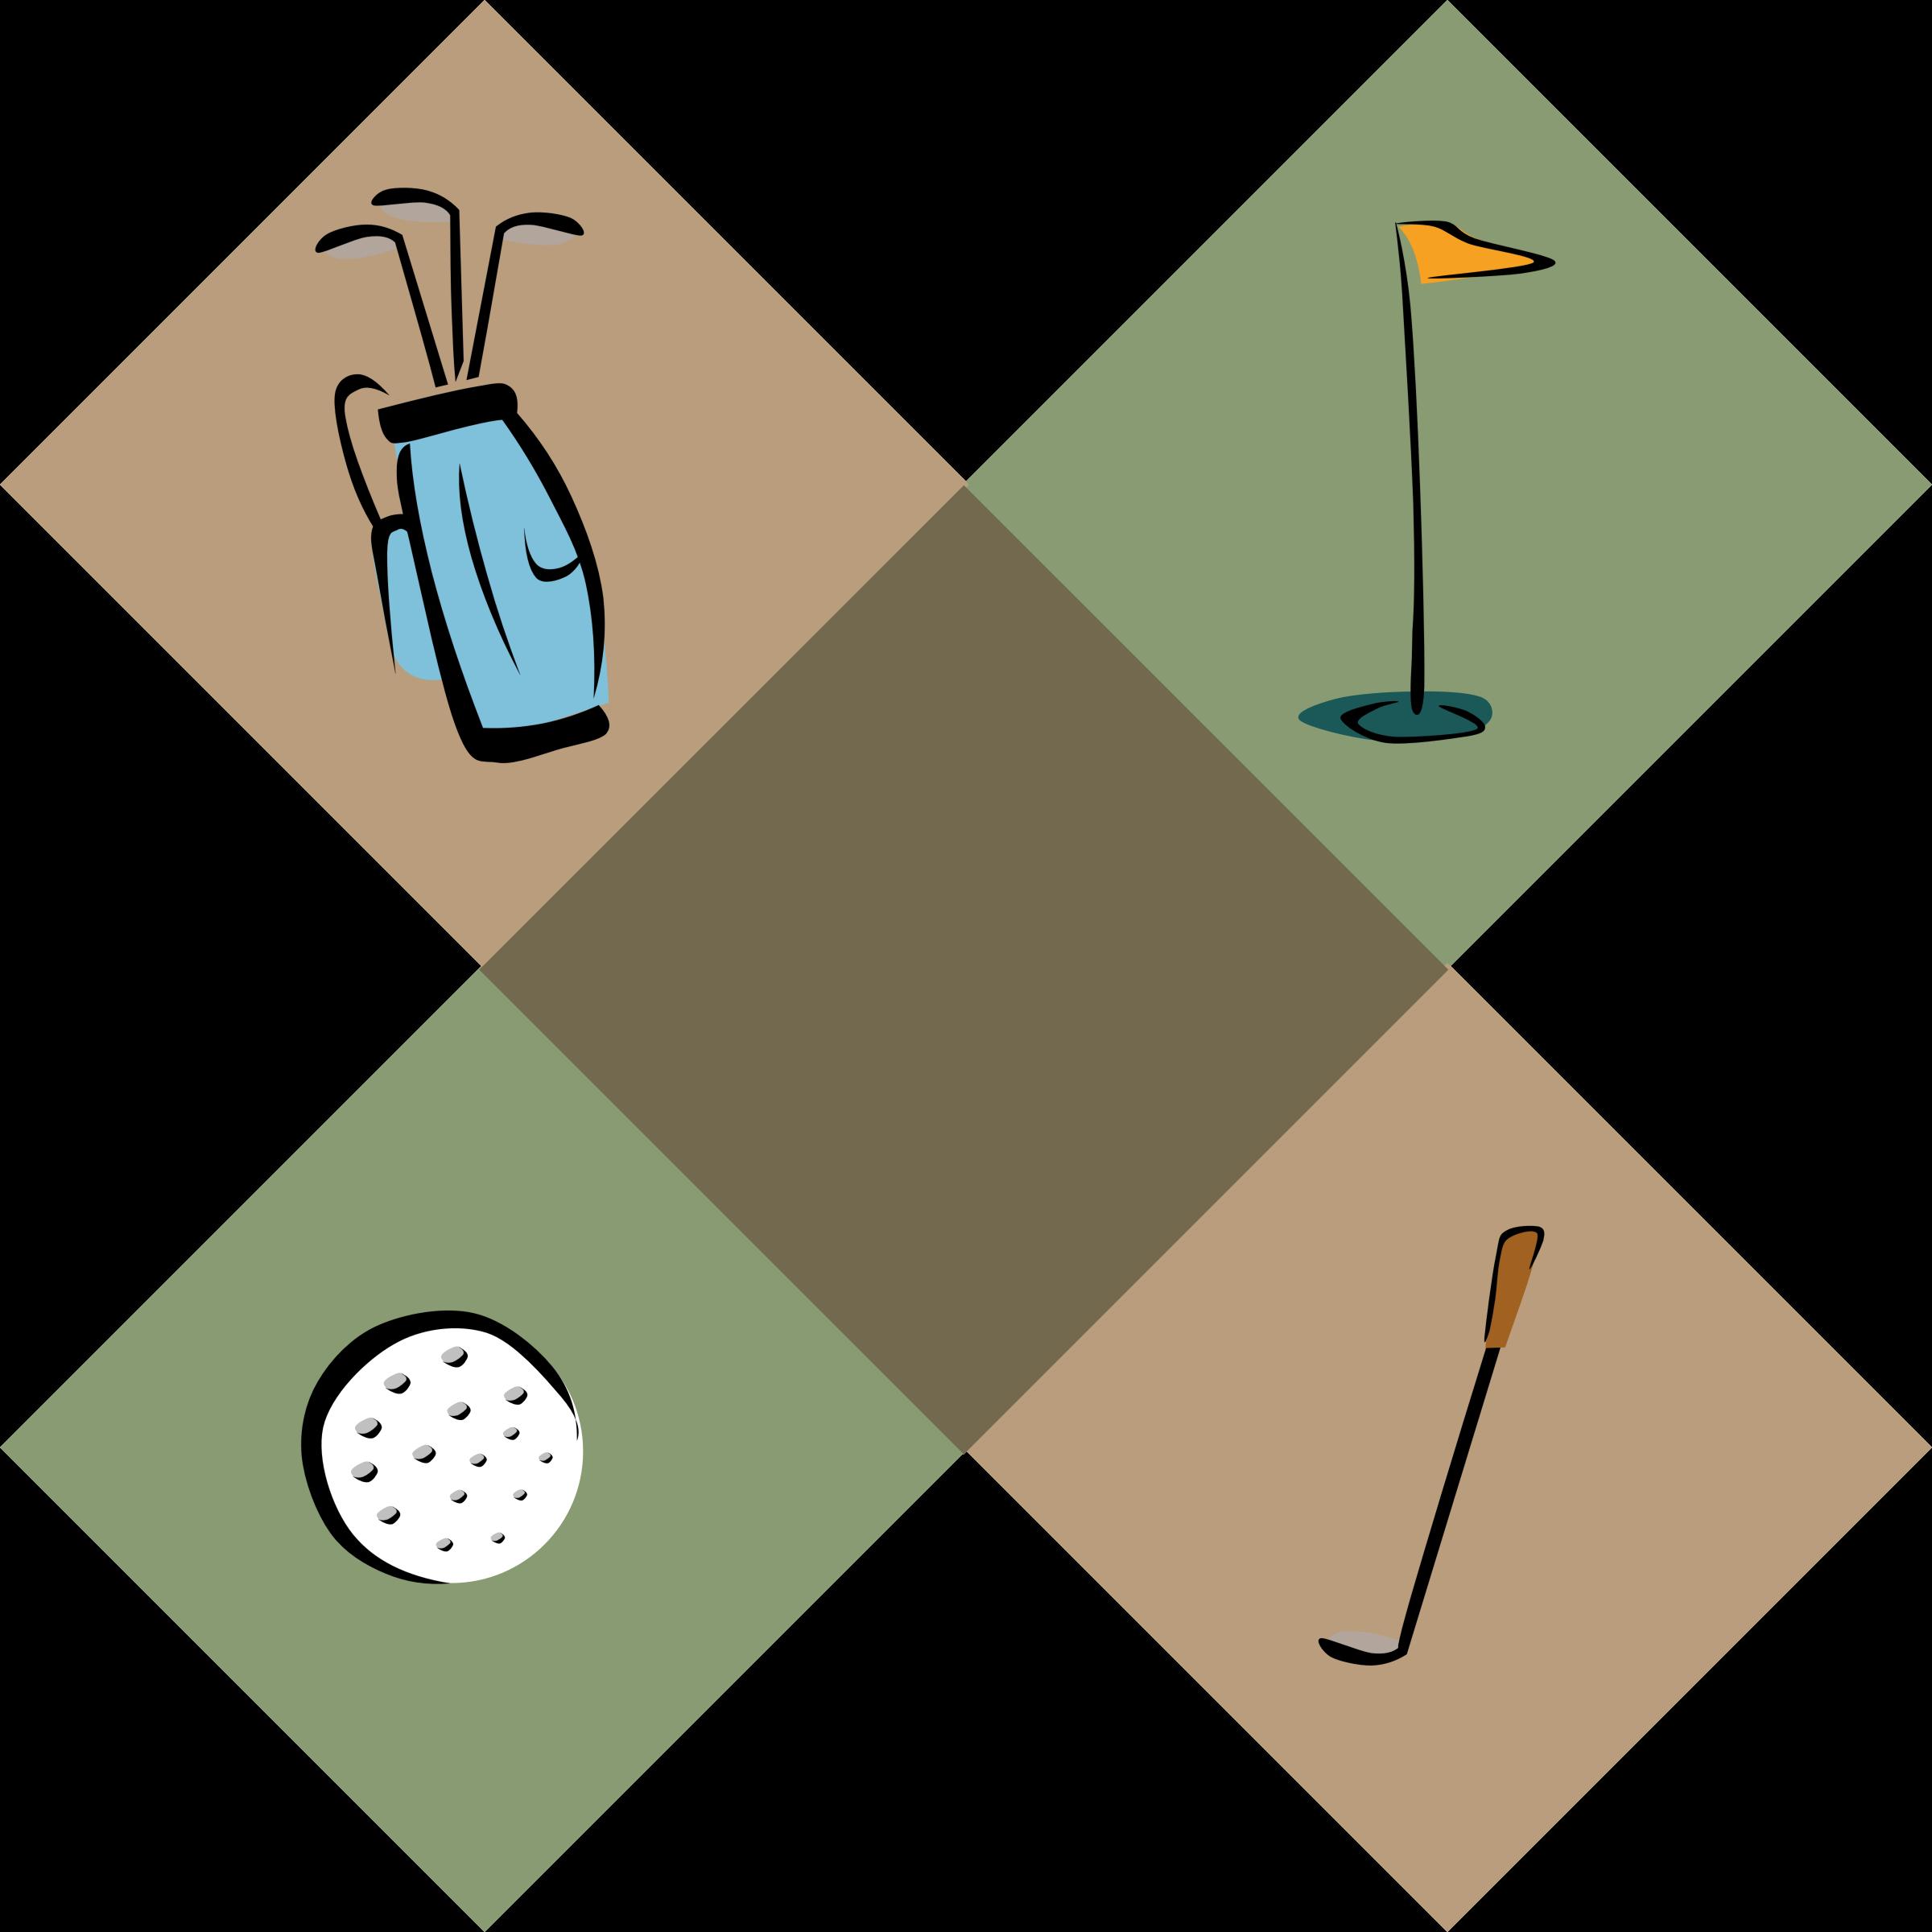 Golf decoration big image. Golfing clipart men's